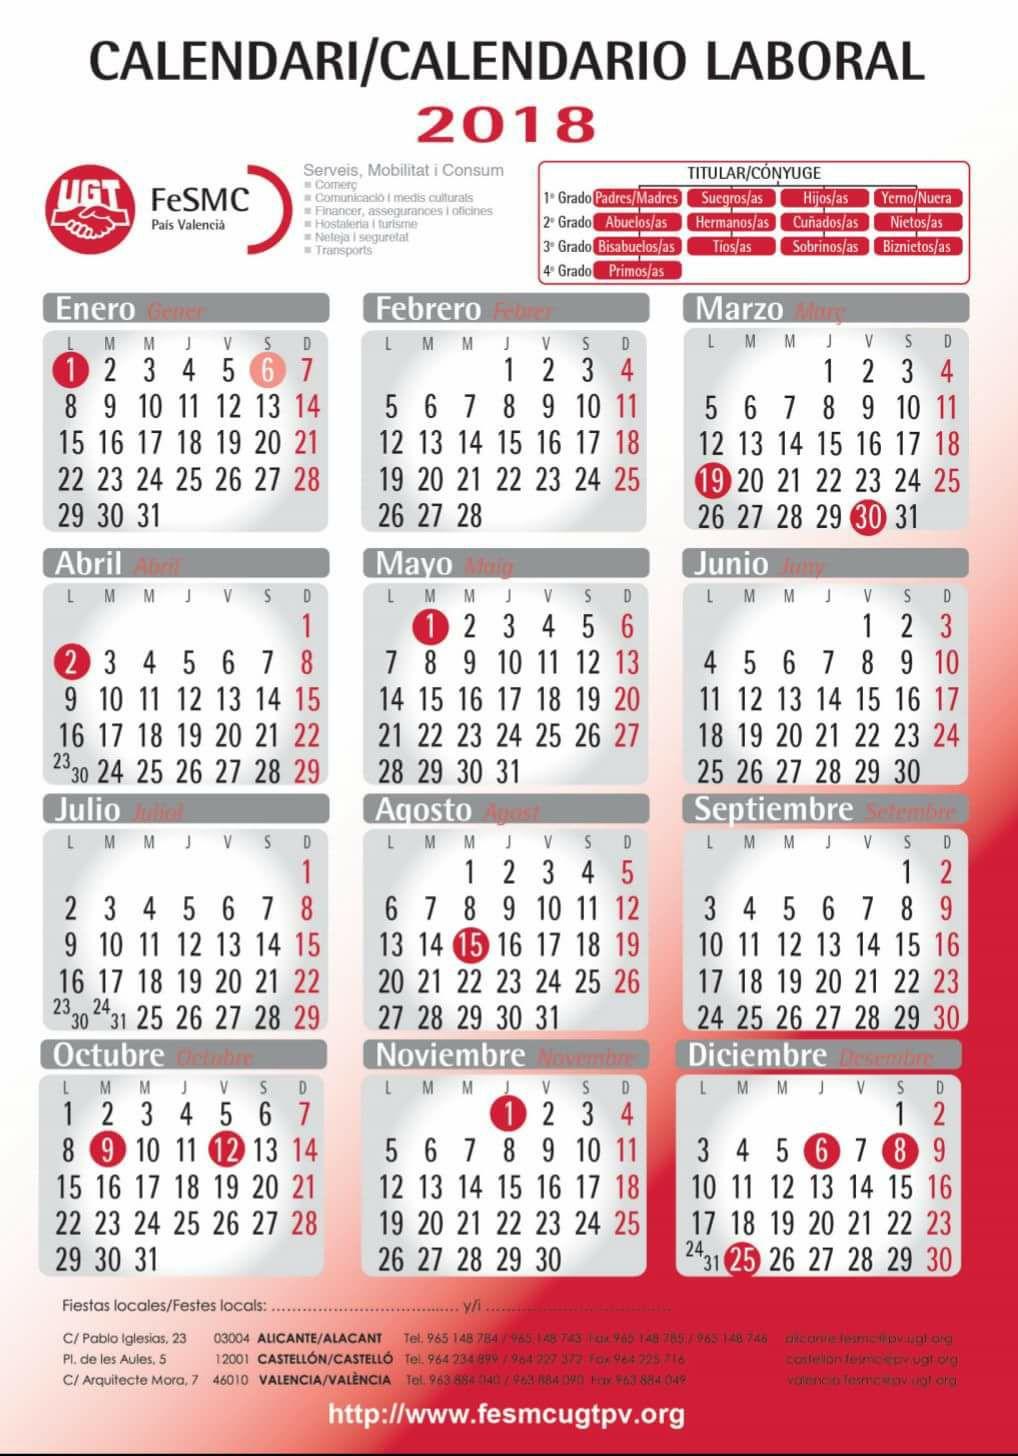 Comit de empresa lidl ugt provincia de alicante for Festivos alicante 2017